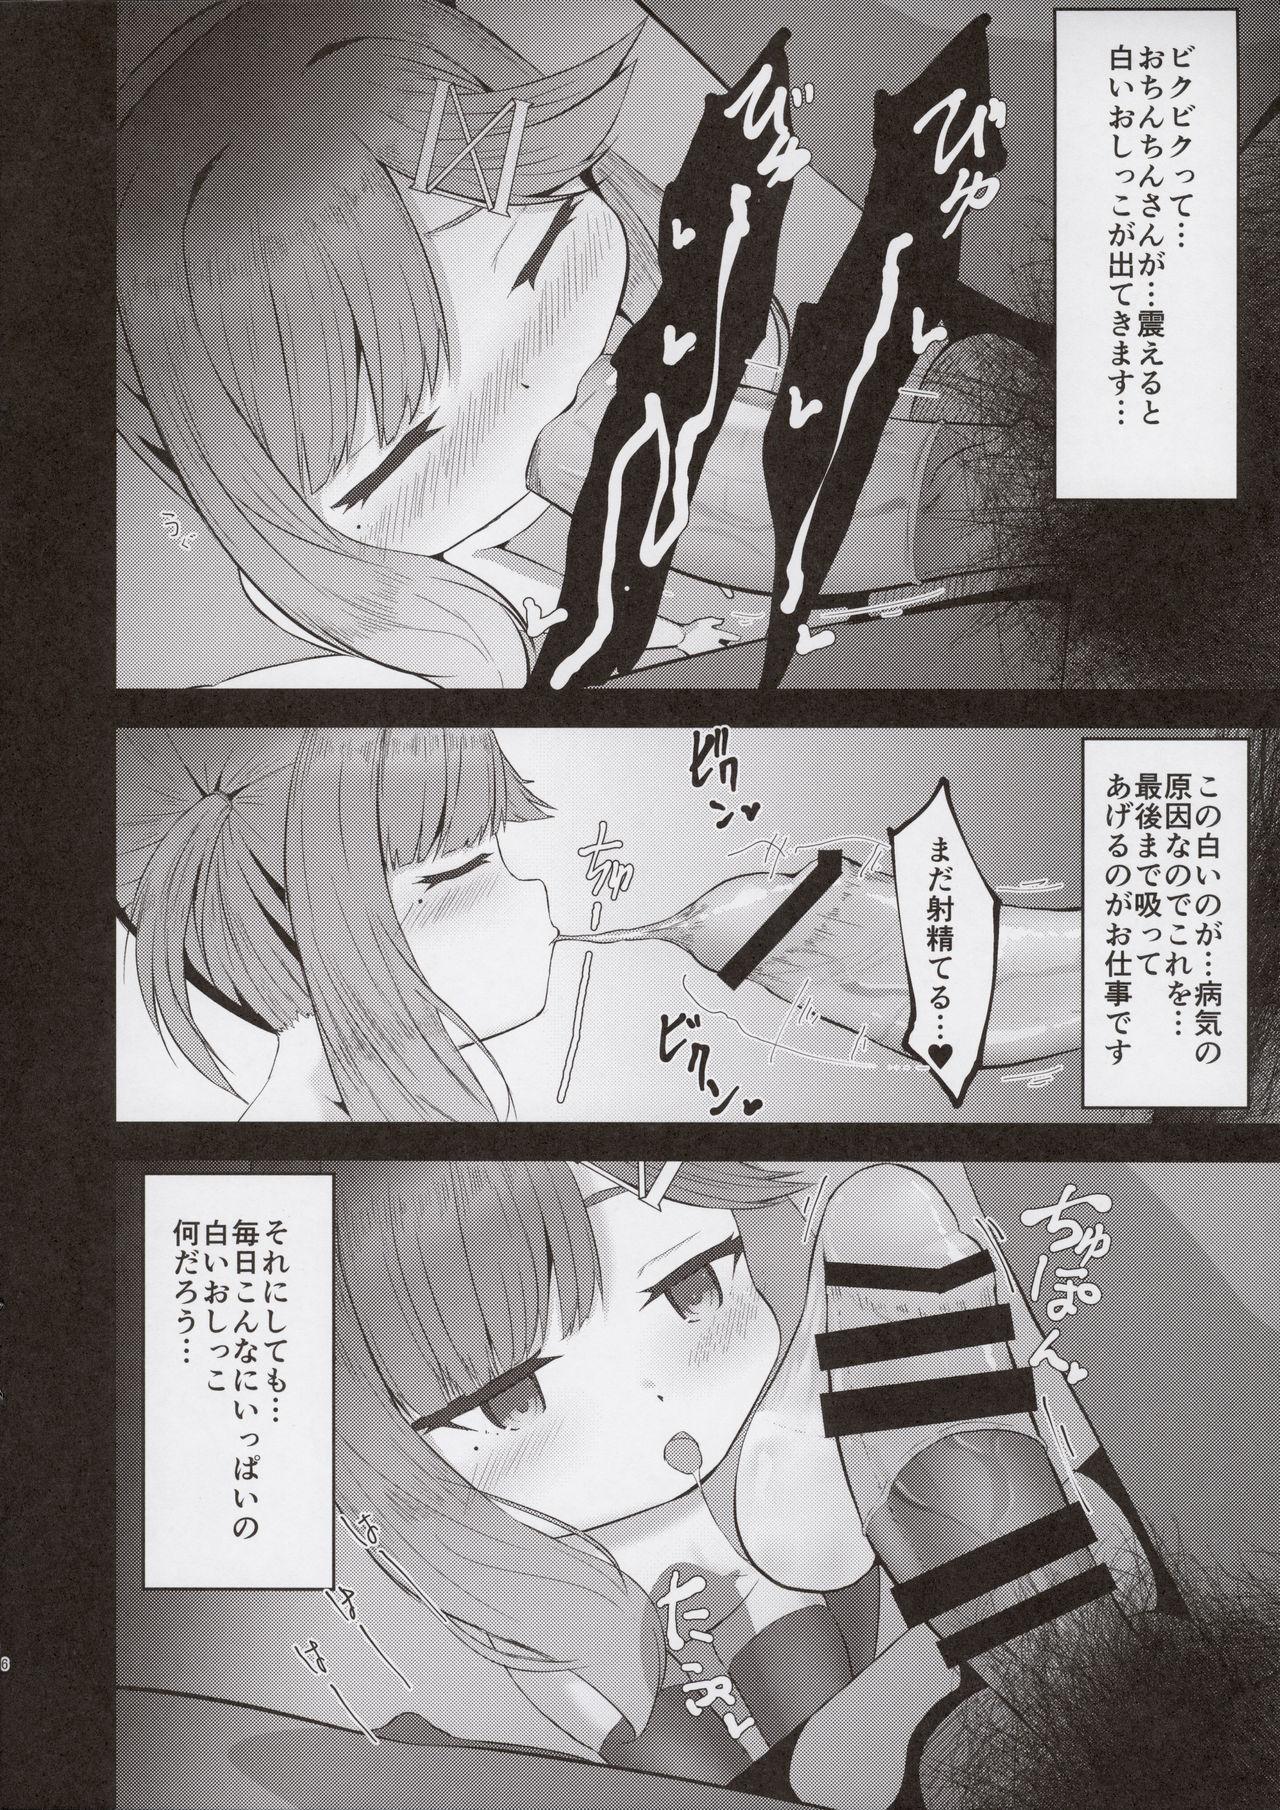 Tsushima to Himegoto 5